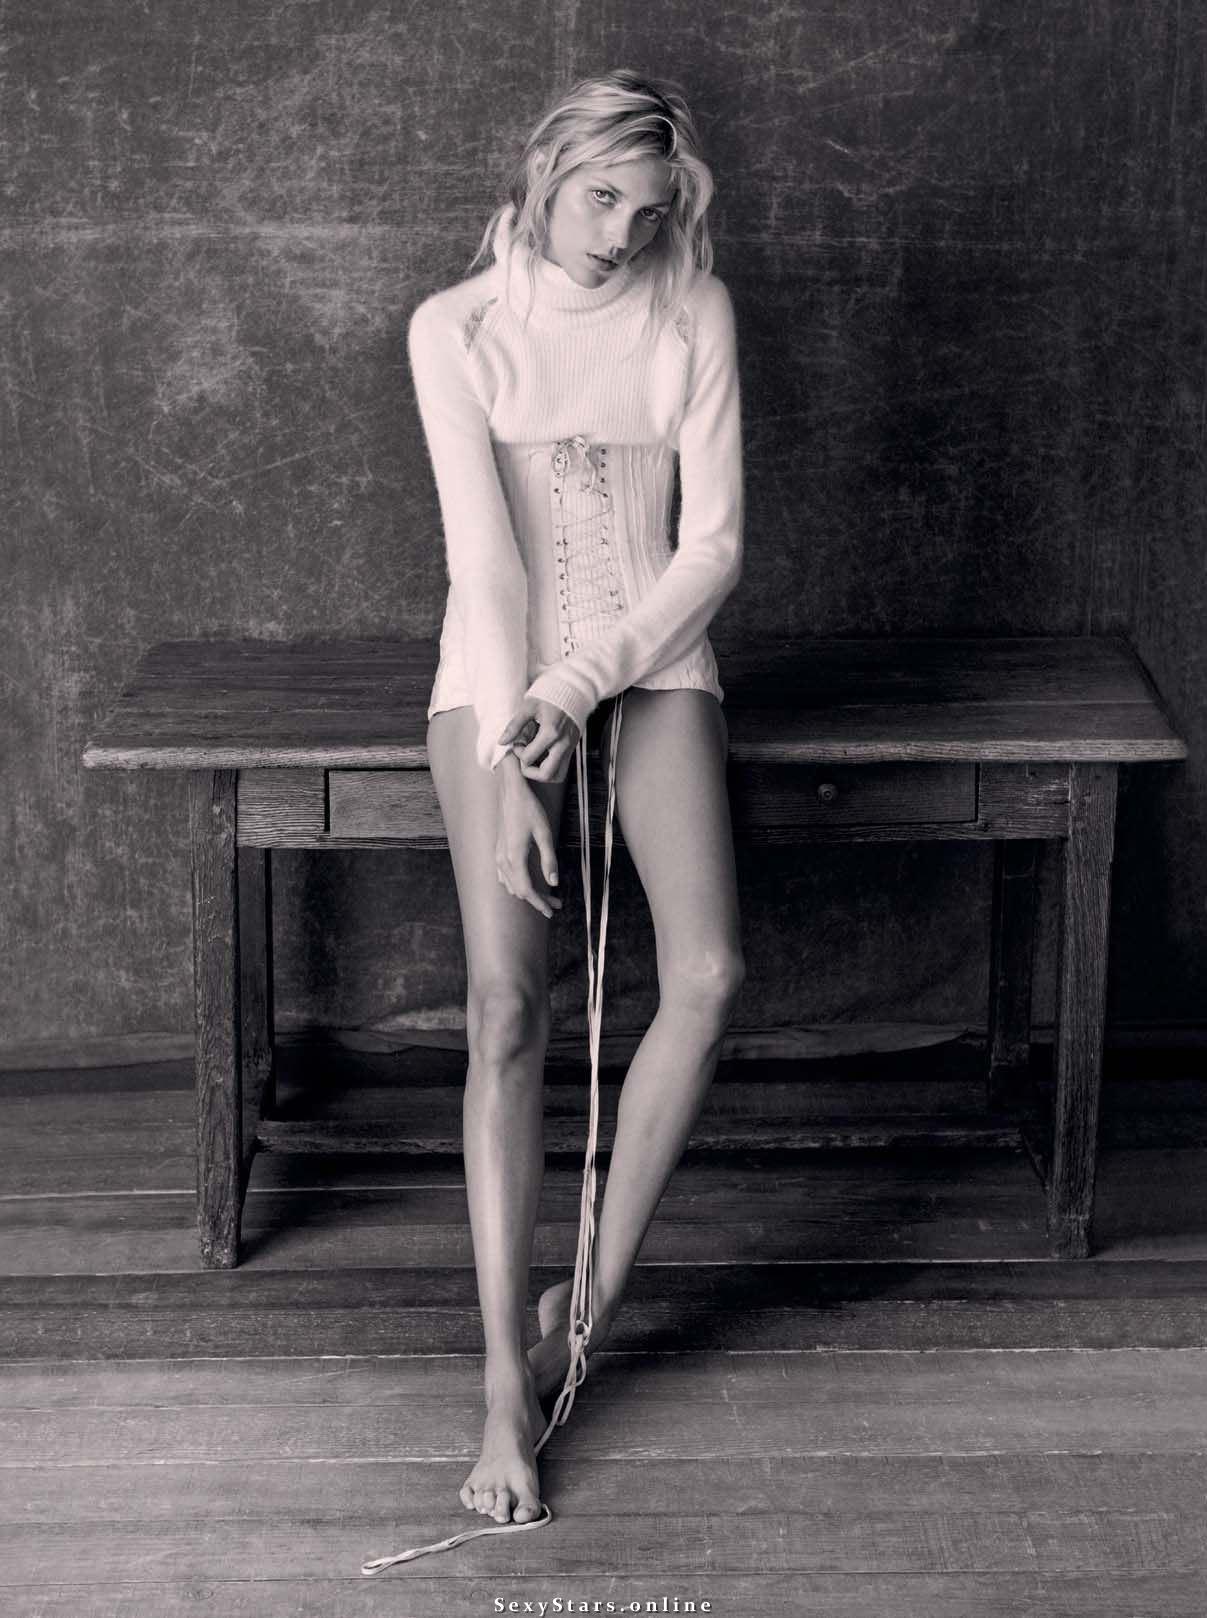 Anja Rubik Nackt. Fotografie - 83